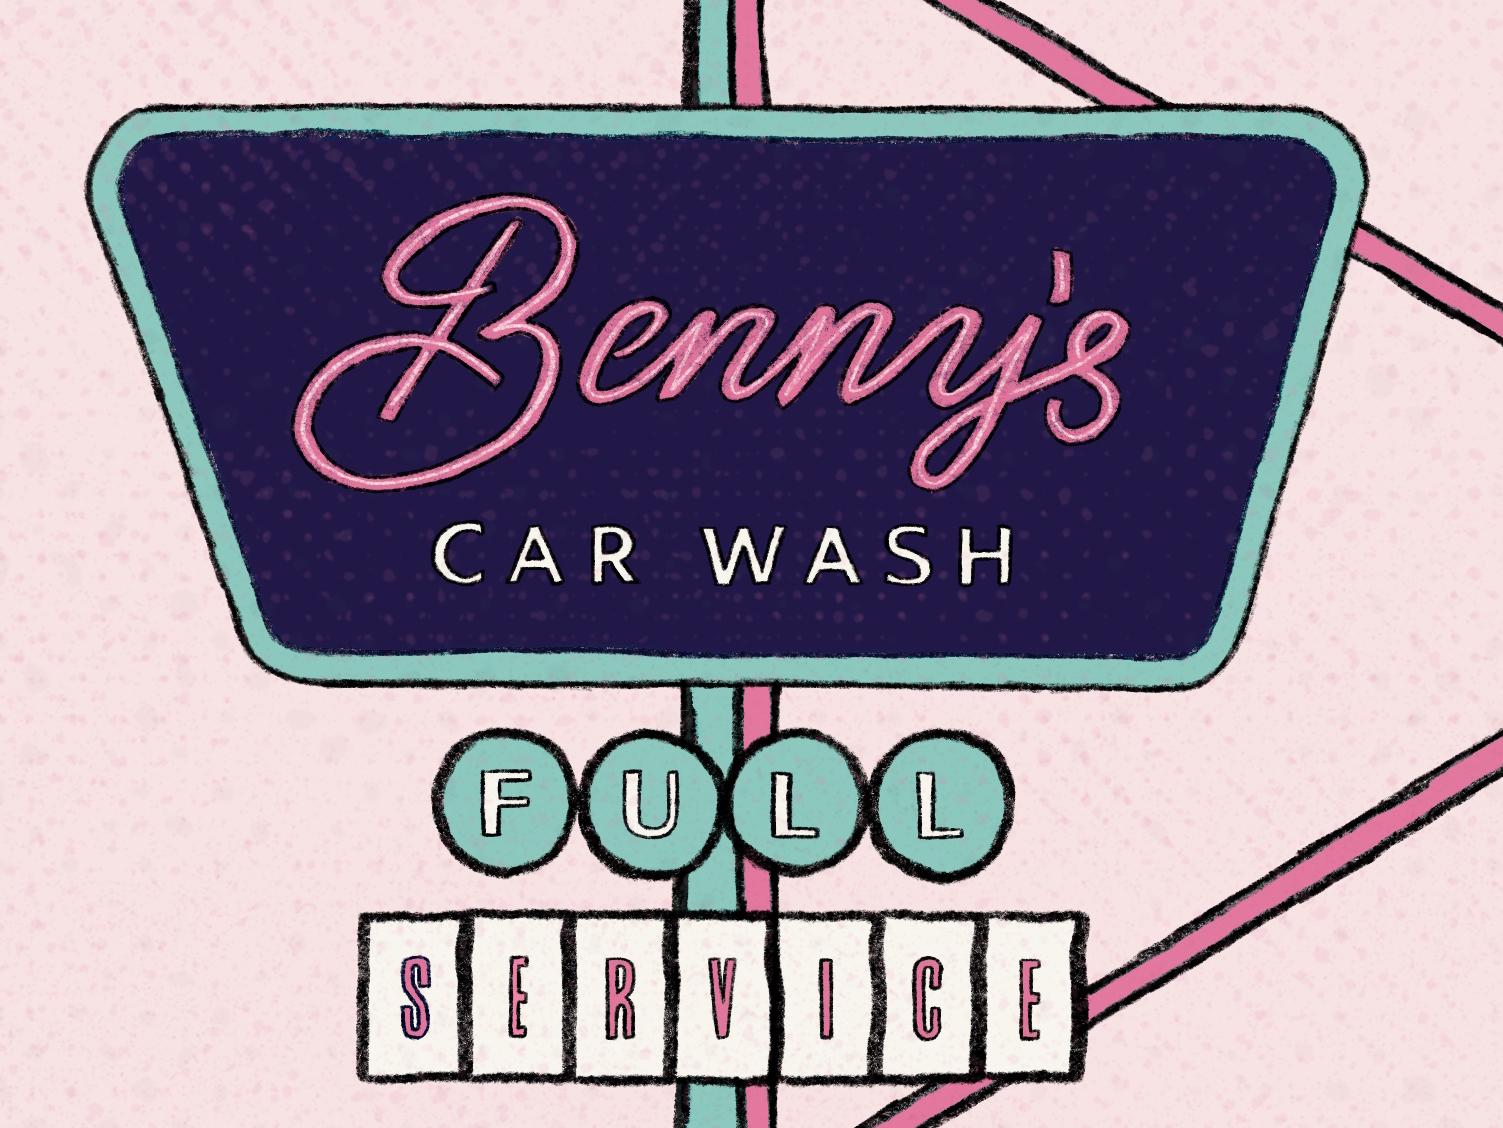 Benny's Car Wash vintage badge retro design retro car wash vintage logo vintage illustrator logo branding design digital lettering illustrated type procreate ipad pro lettering illustration hand rendered type typography hand lettering